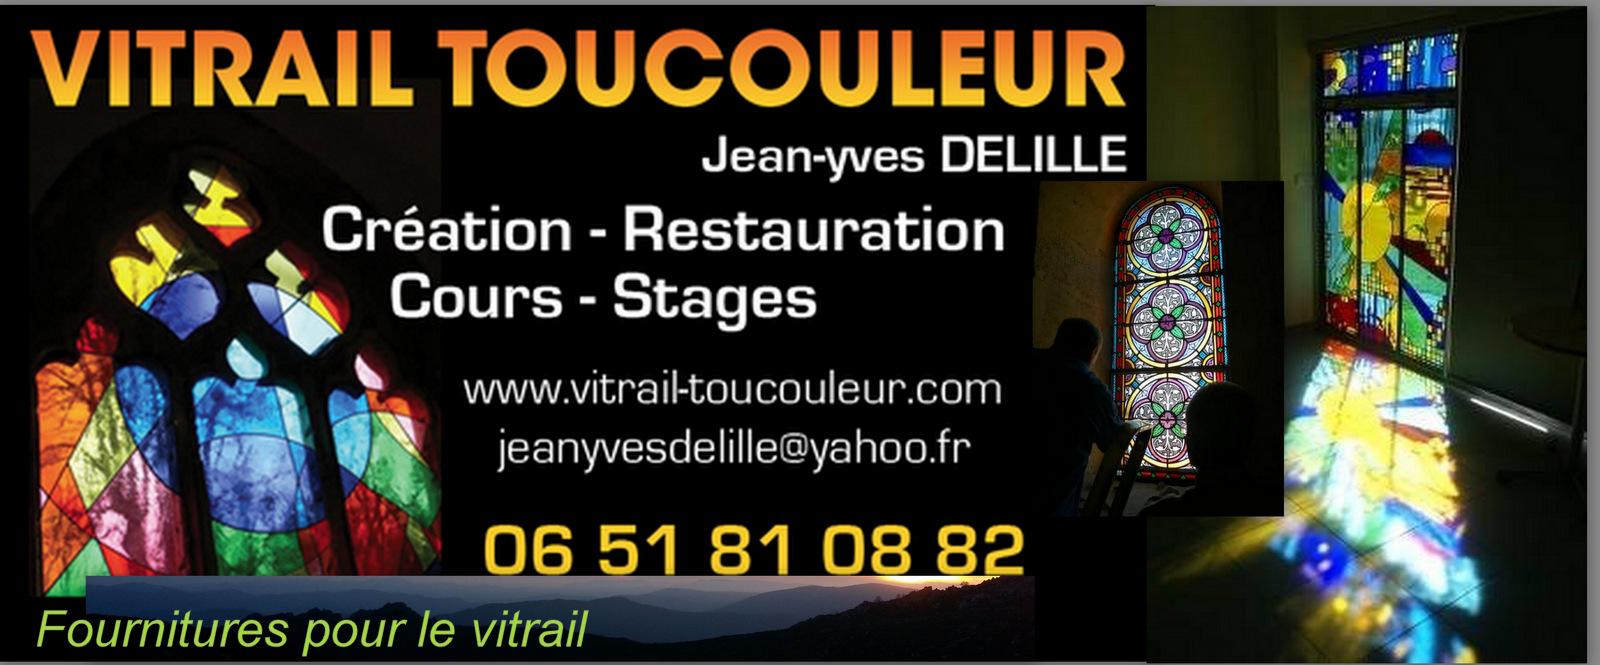 ATELIER VITRAIL, STAGE VITRAIL, FORMATION, COURS DE VITRAUX